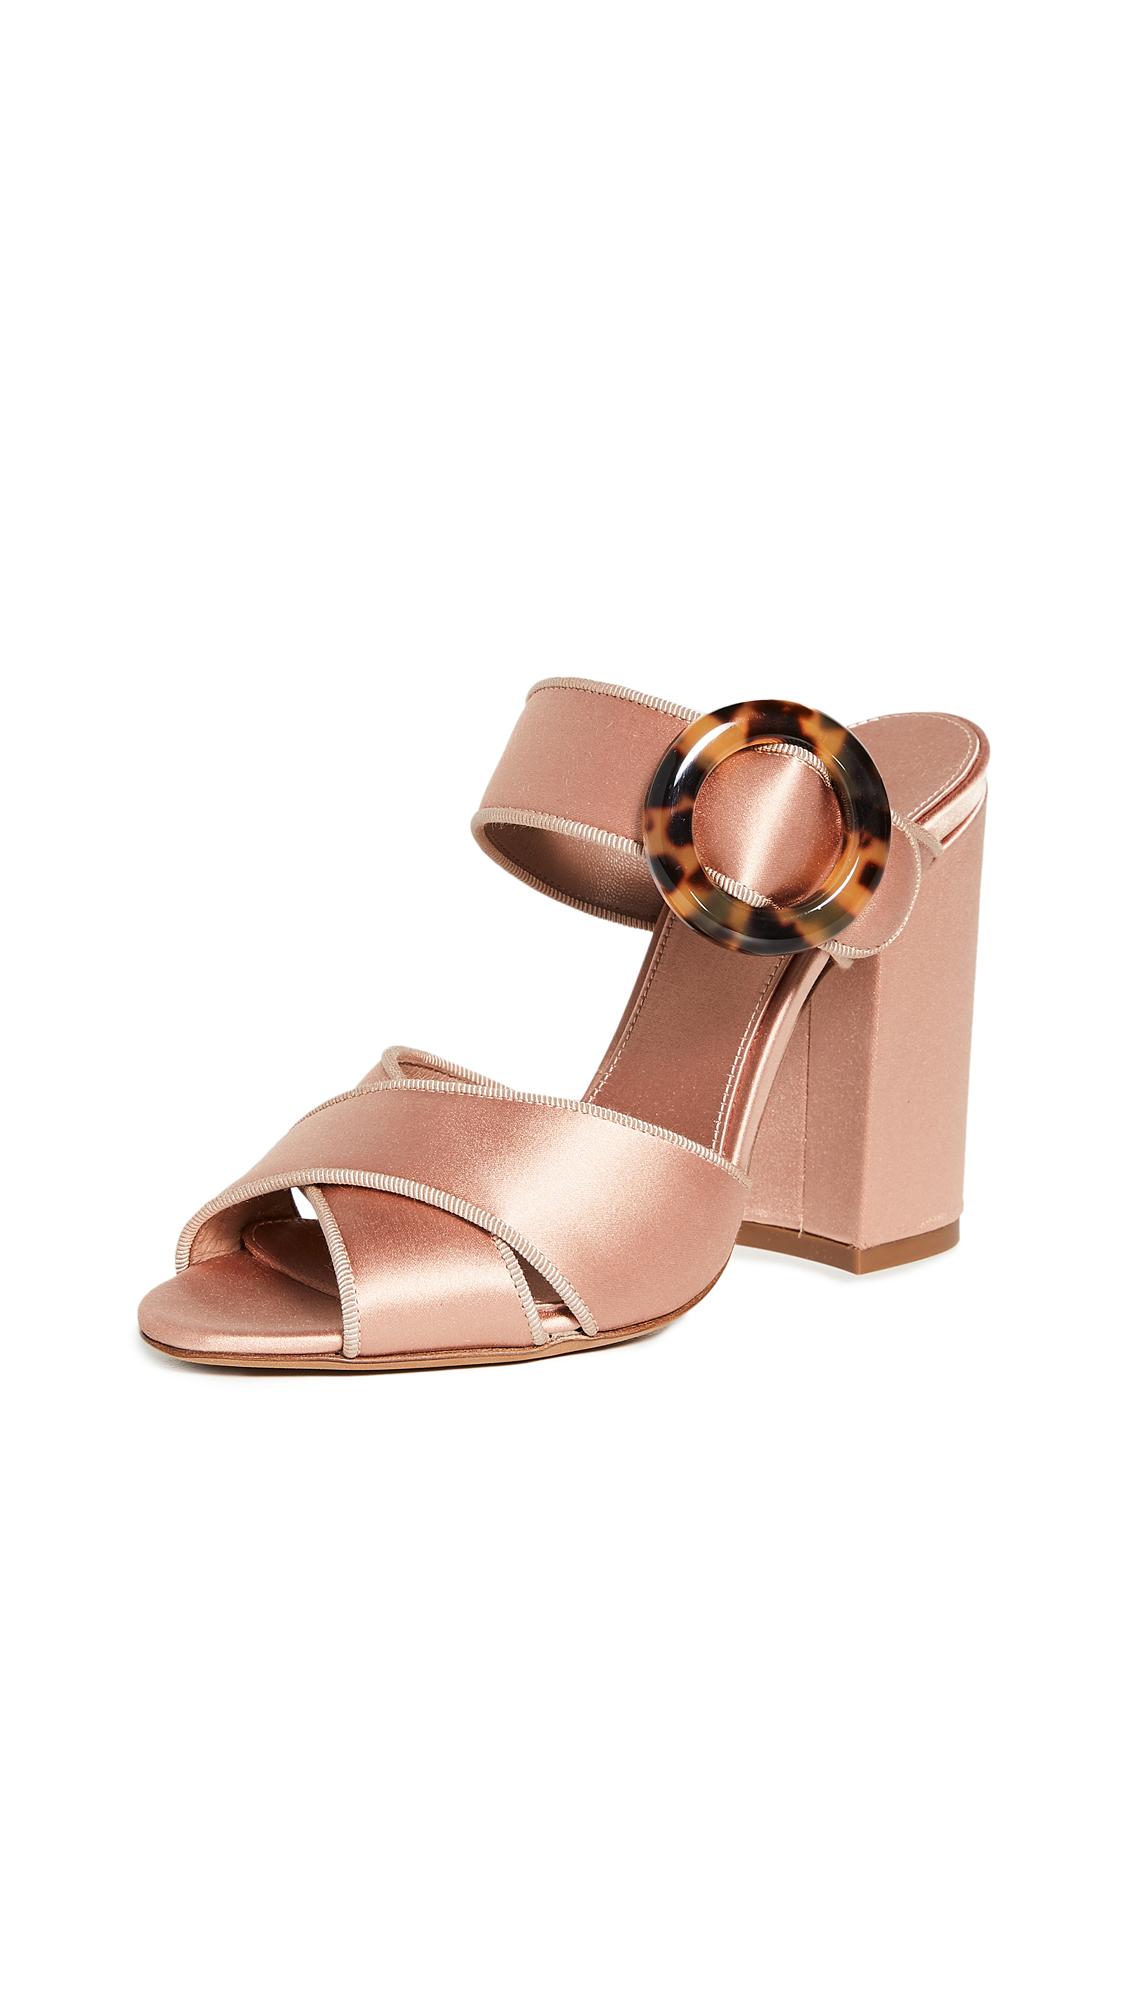 Buy Tabitha Simmons Reyner Slides online, shop Tabitha Simmons